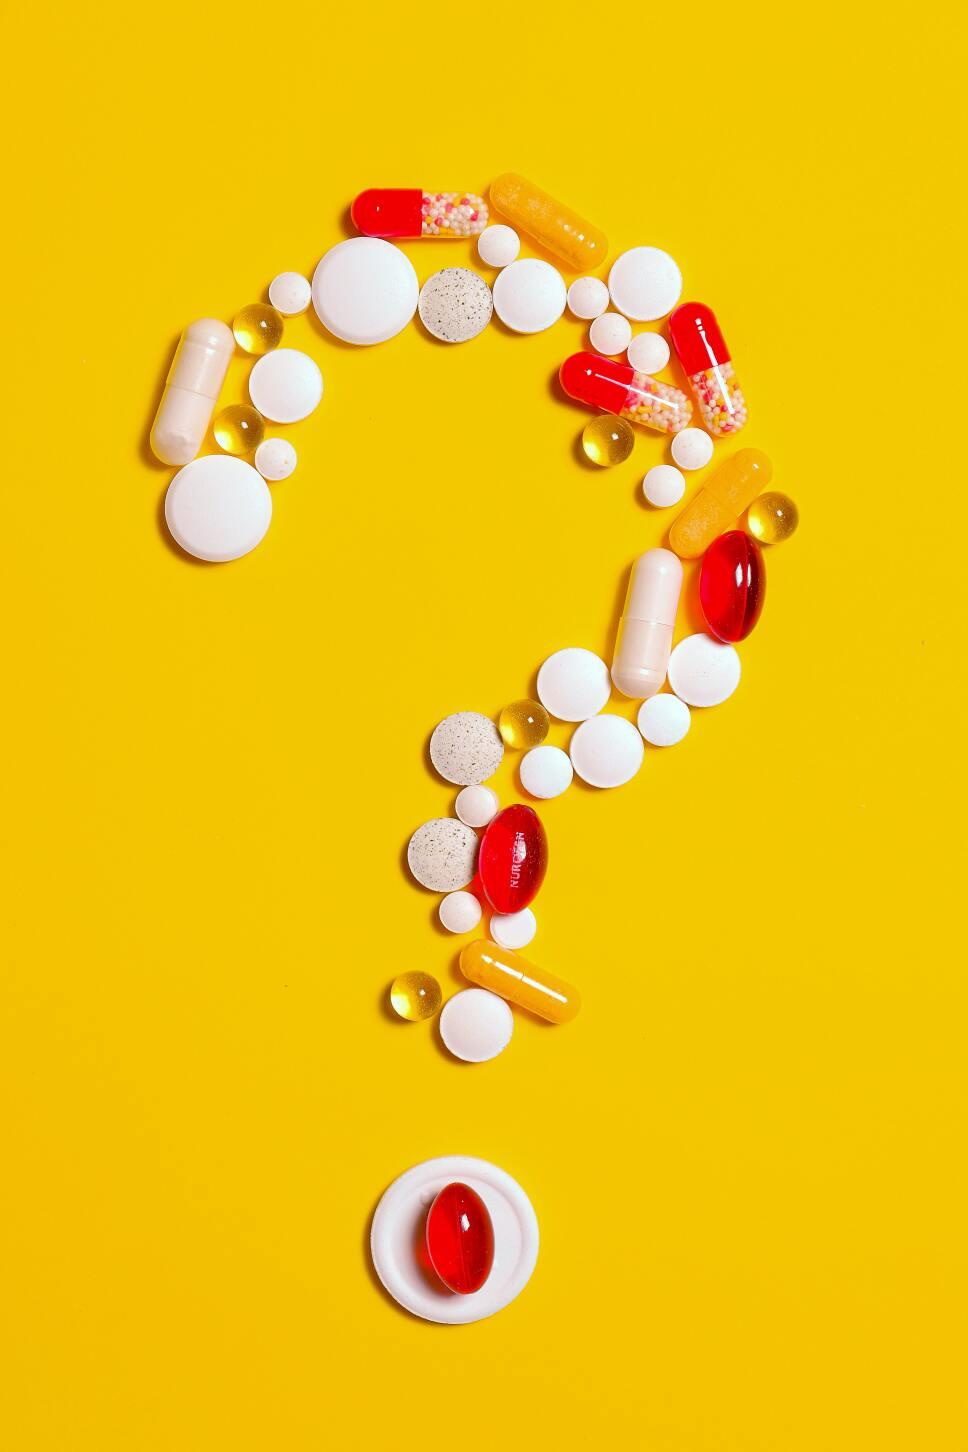 Vitaminas contra el coronavirus.jpg